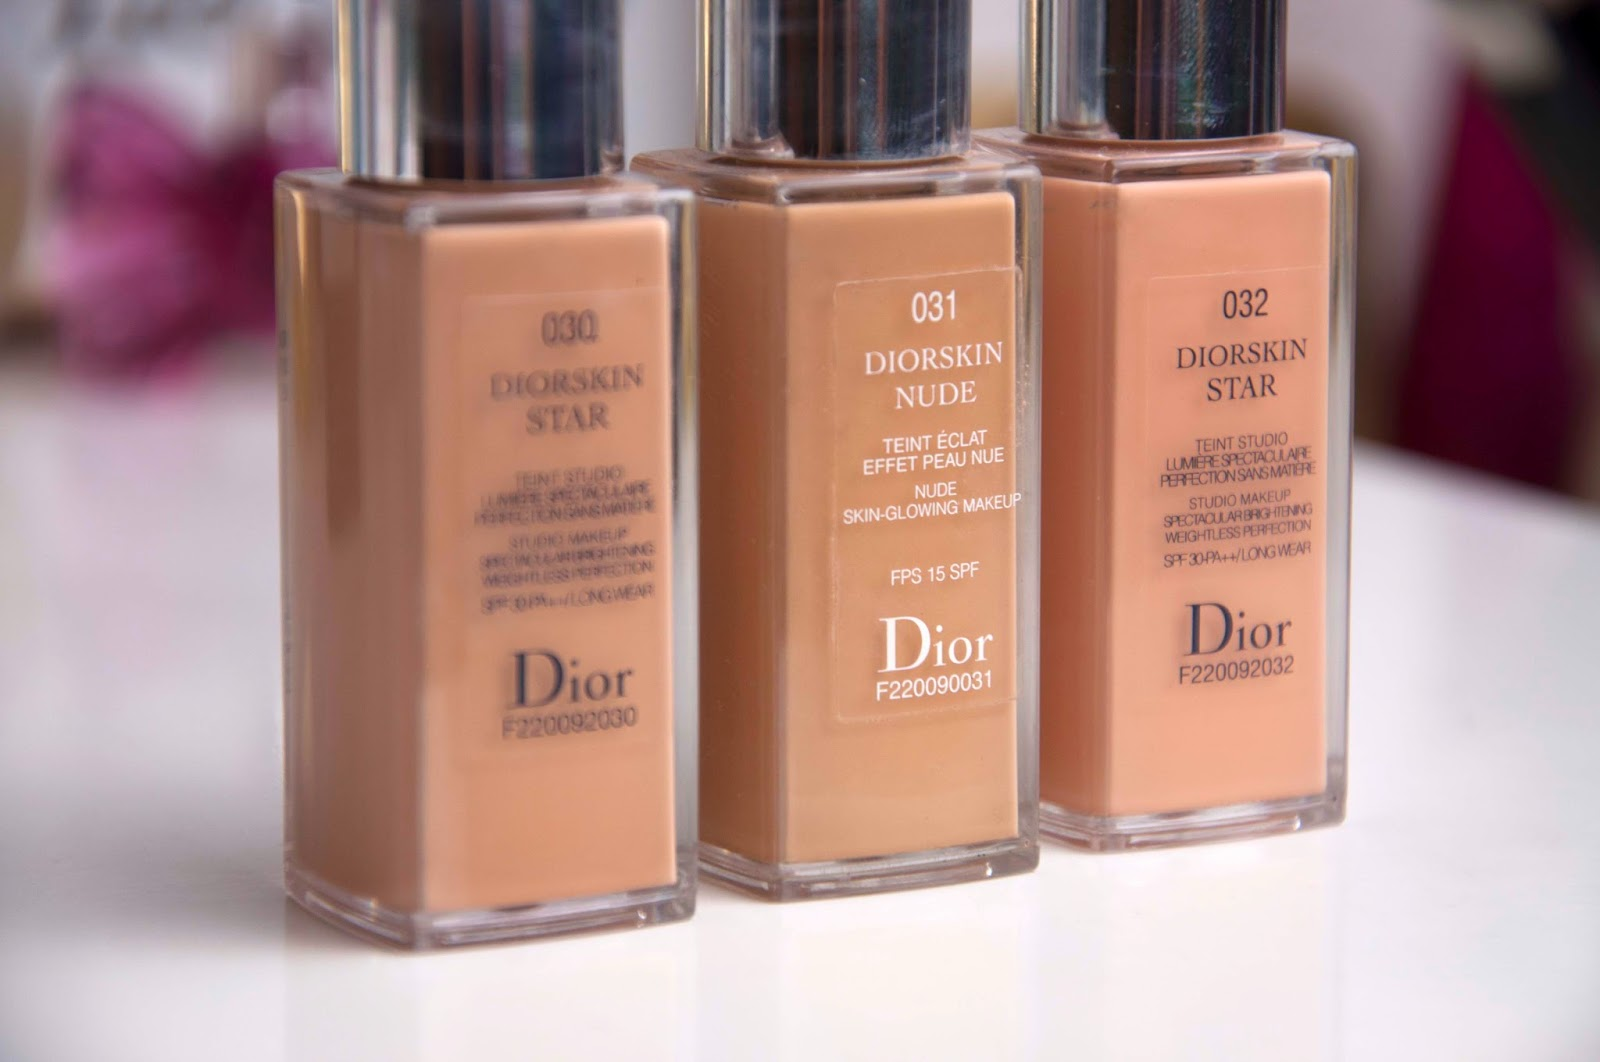 Diorskin Nude Foundation